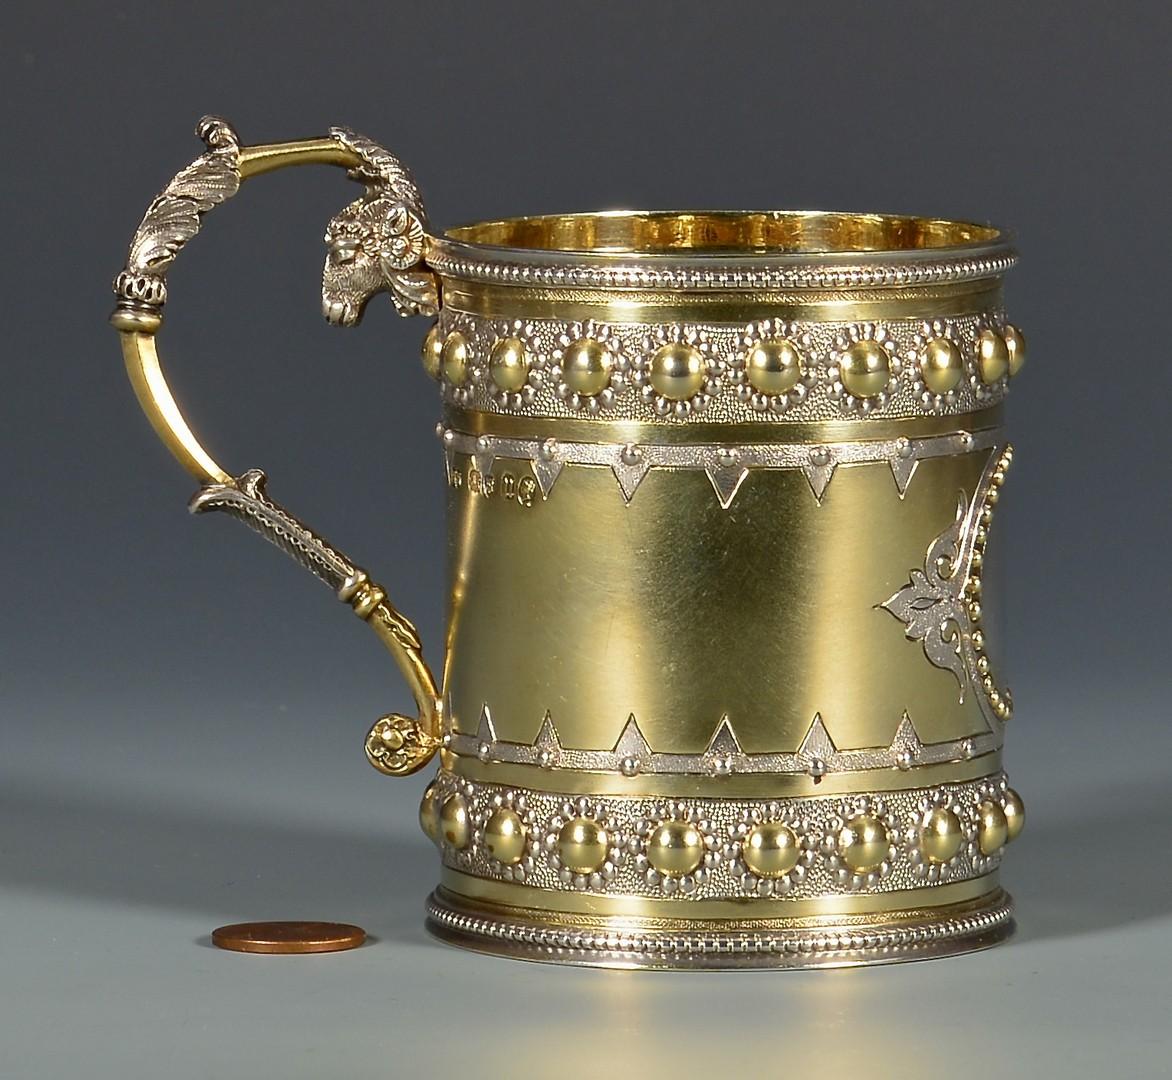 Lot 47: Gilt Silver Cup in Presentation Case